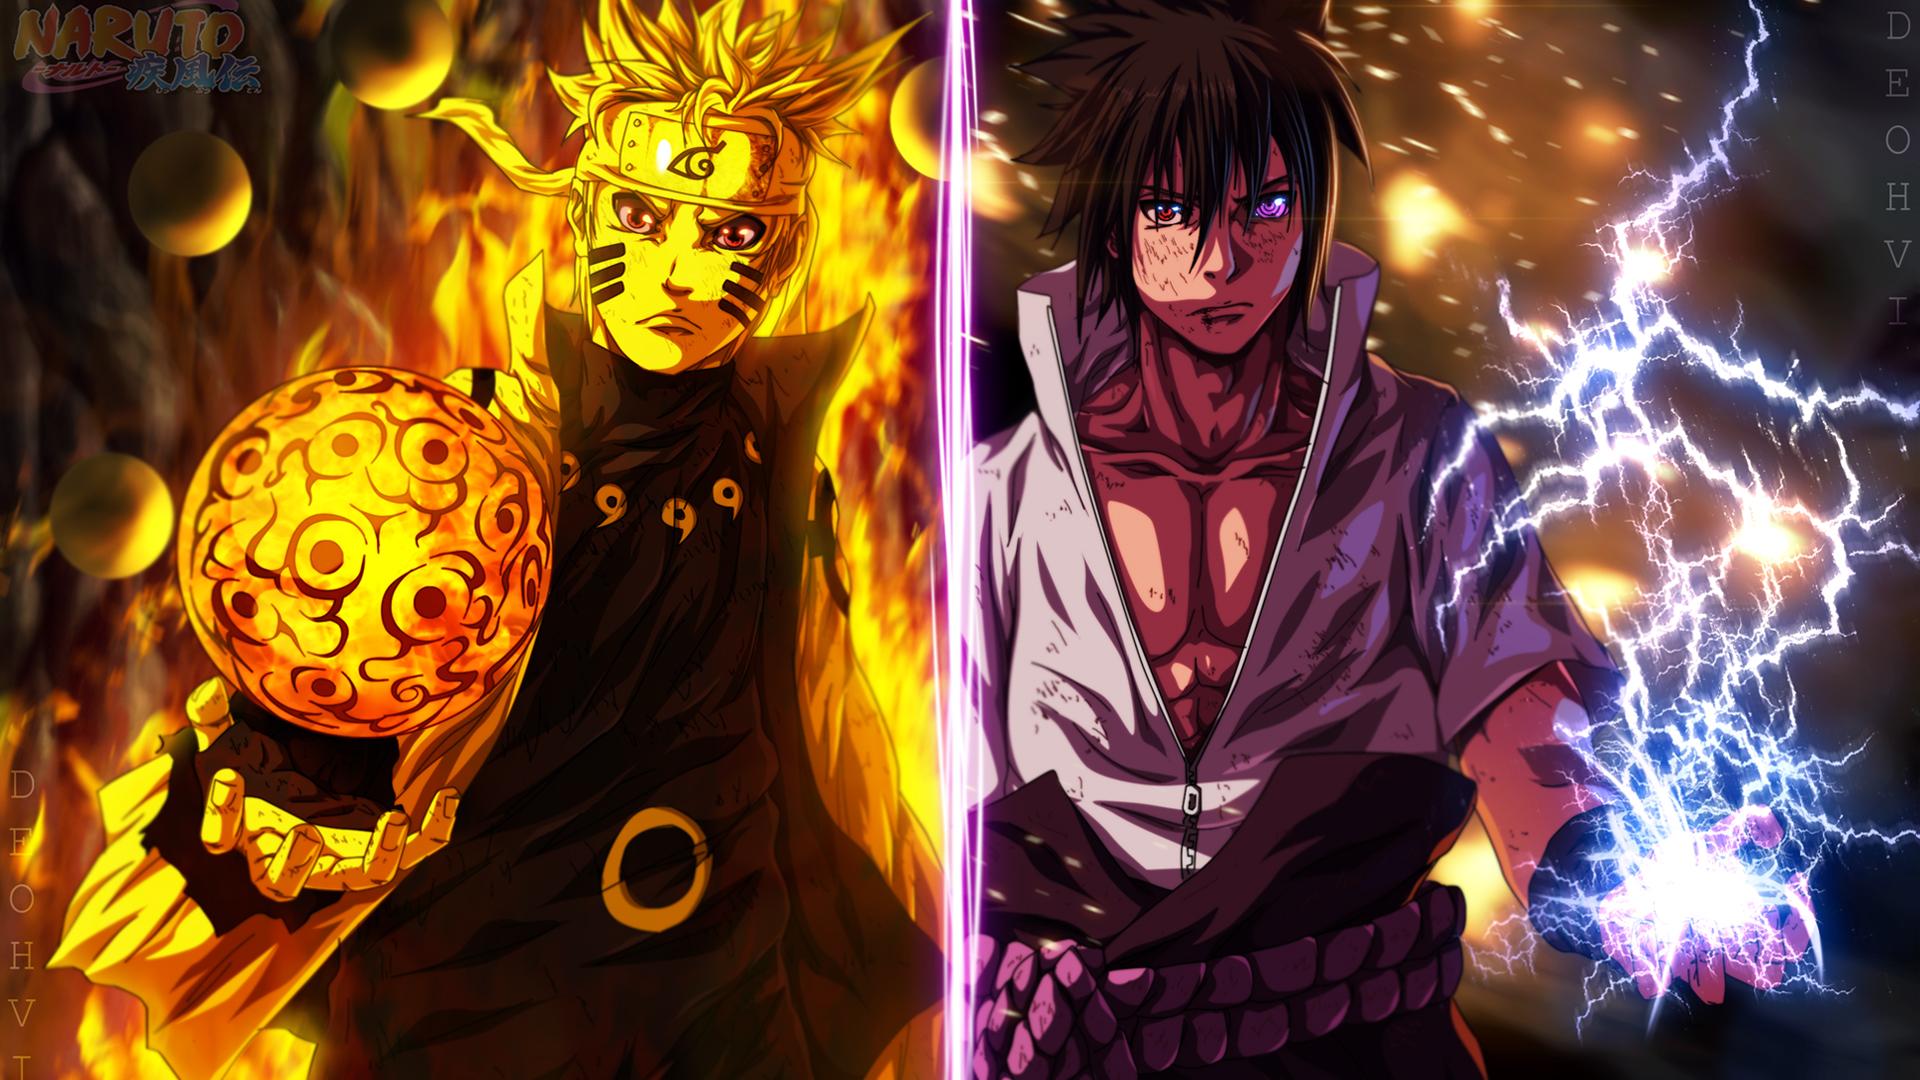 Naruto Vs Sasuke Wallpaper